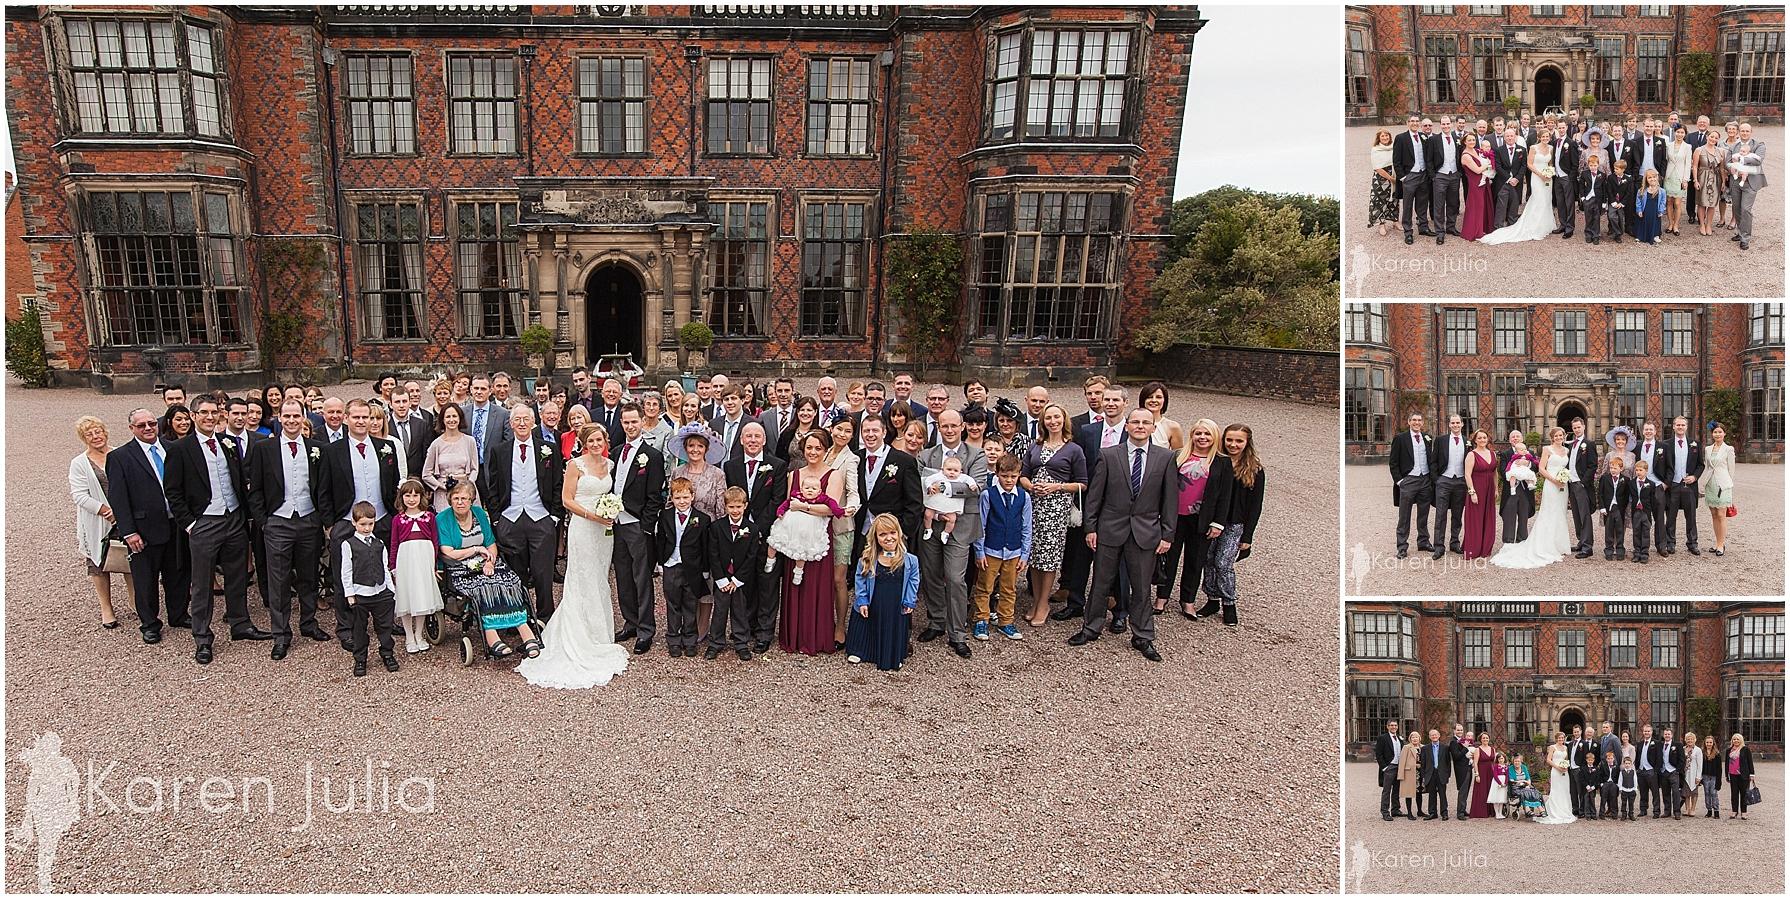 Arley-Hall-Winter-Wedding-Photography-13